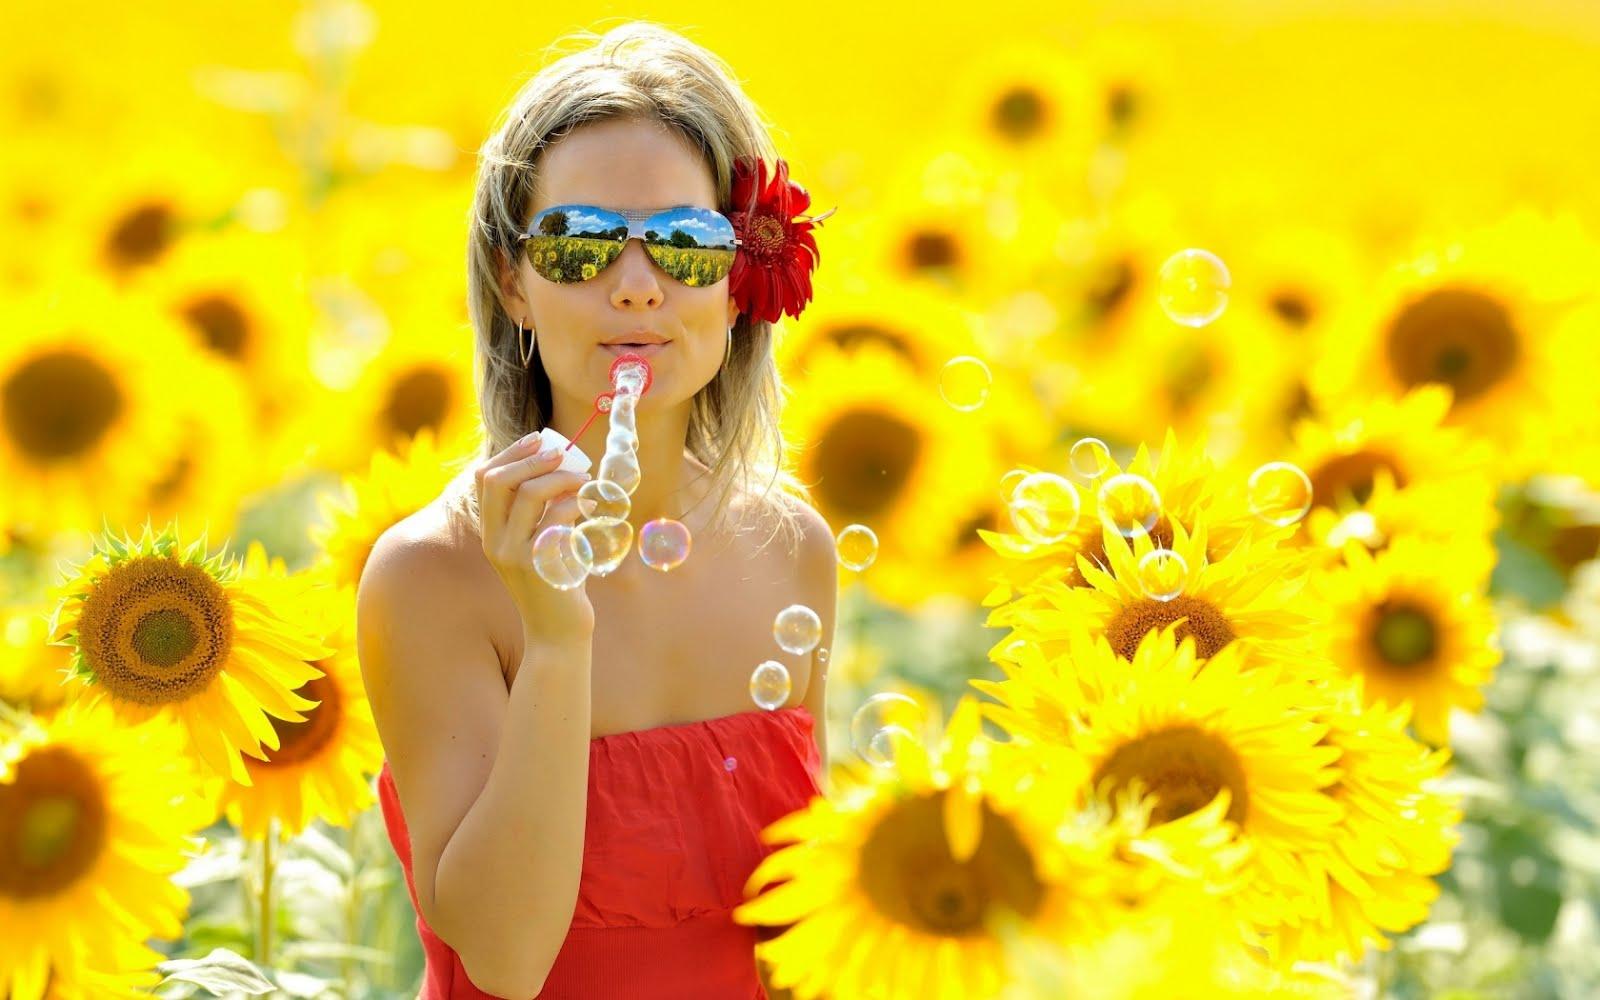 http://4.bp.blogspot.com/-pQYJ-Y2CQ_Y/UClyzvjC_1I/AAAAAAAAByA/_dUQaLSceq8/s1600/girl_blonde_field_flowers_bubbles_mood_25253_1680x1050.jpg